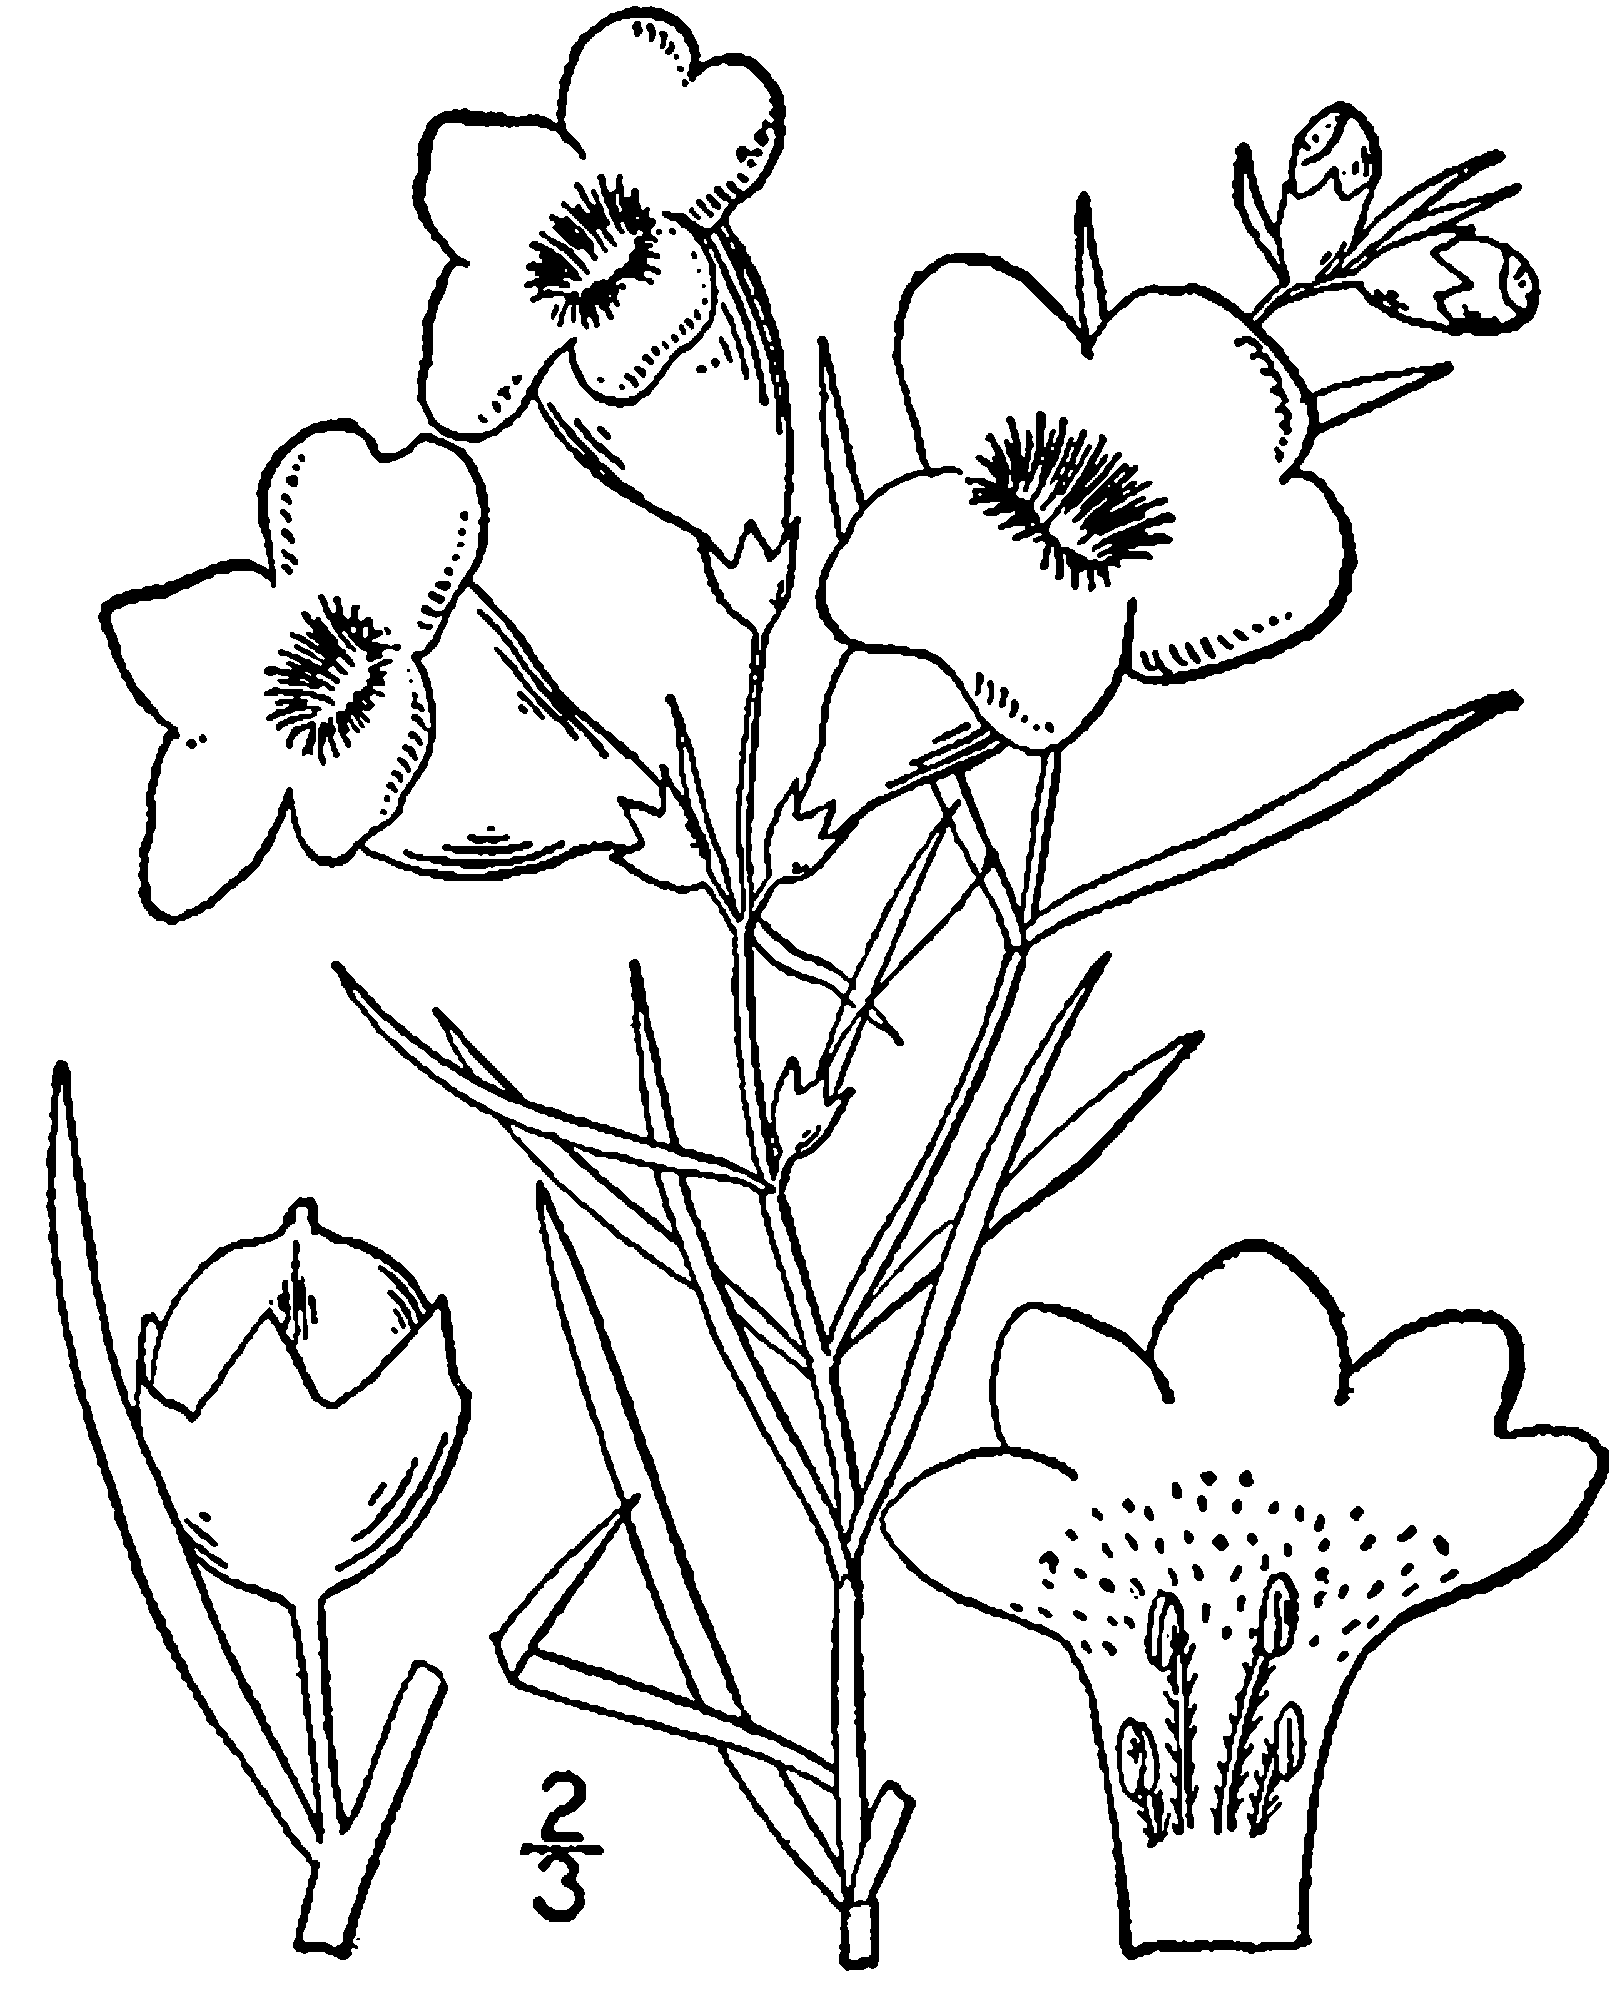 1624x2000 Fileagalinis Purpurea Drawing.png